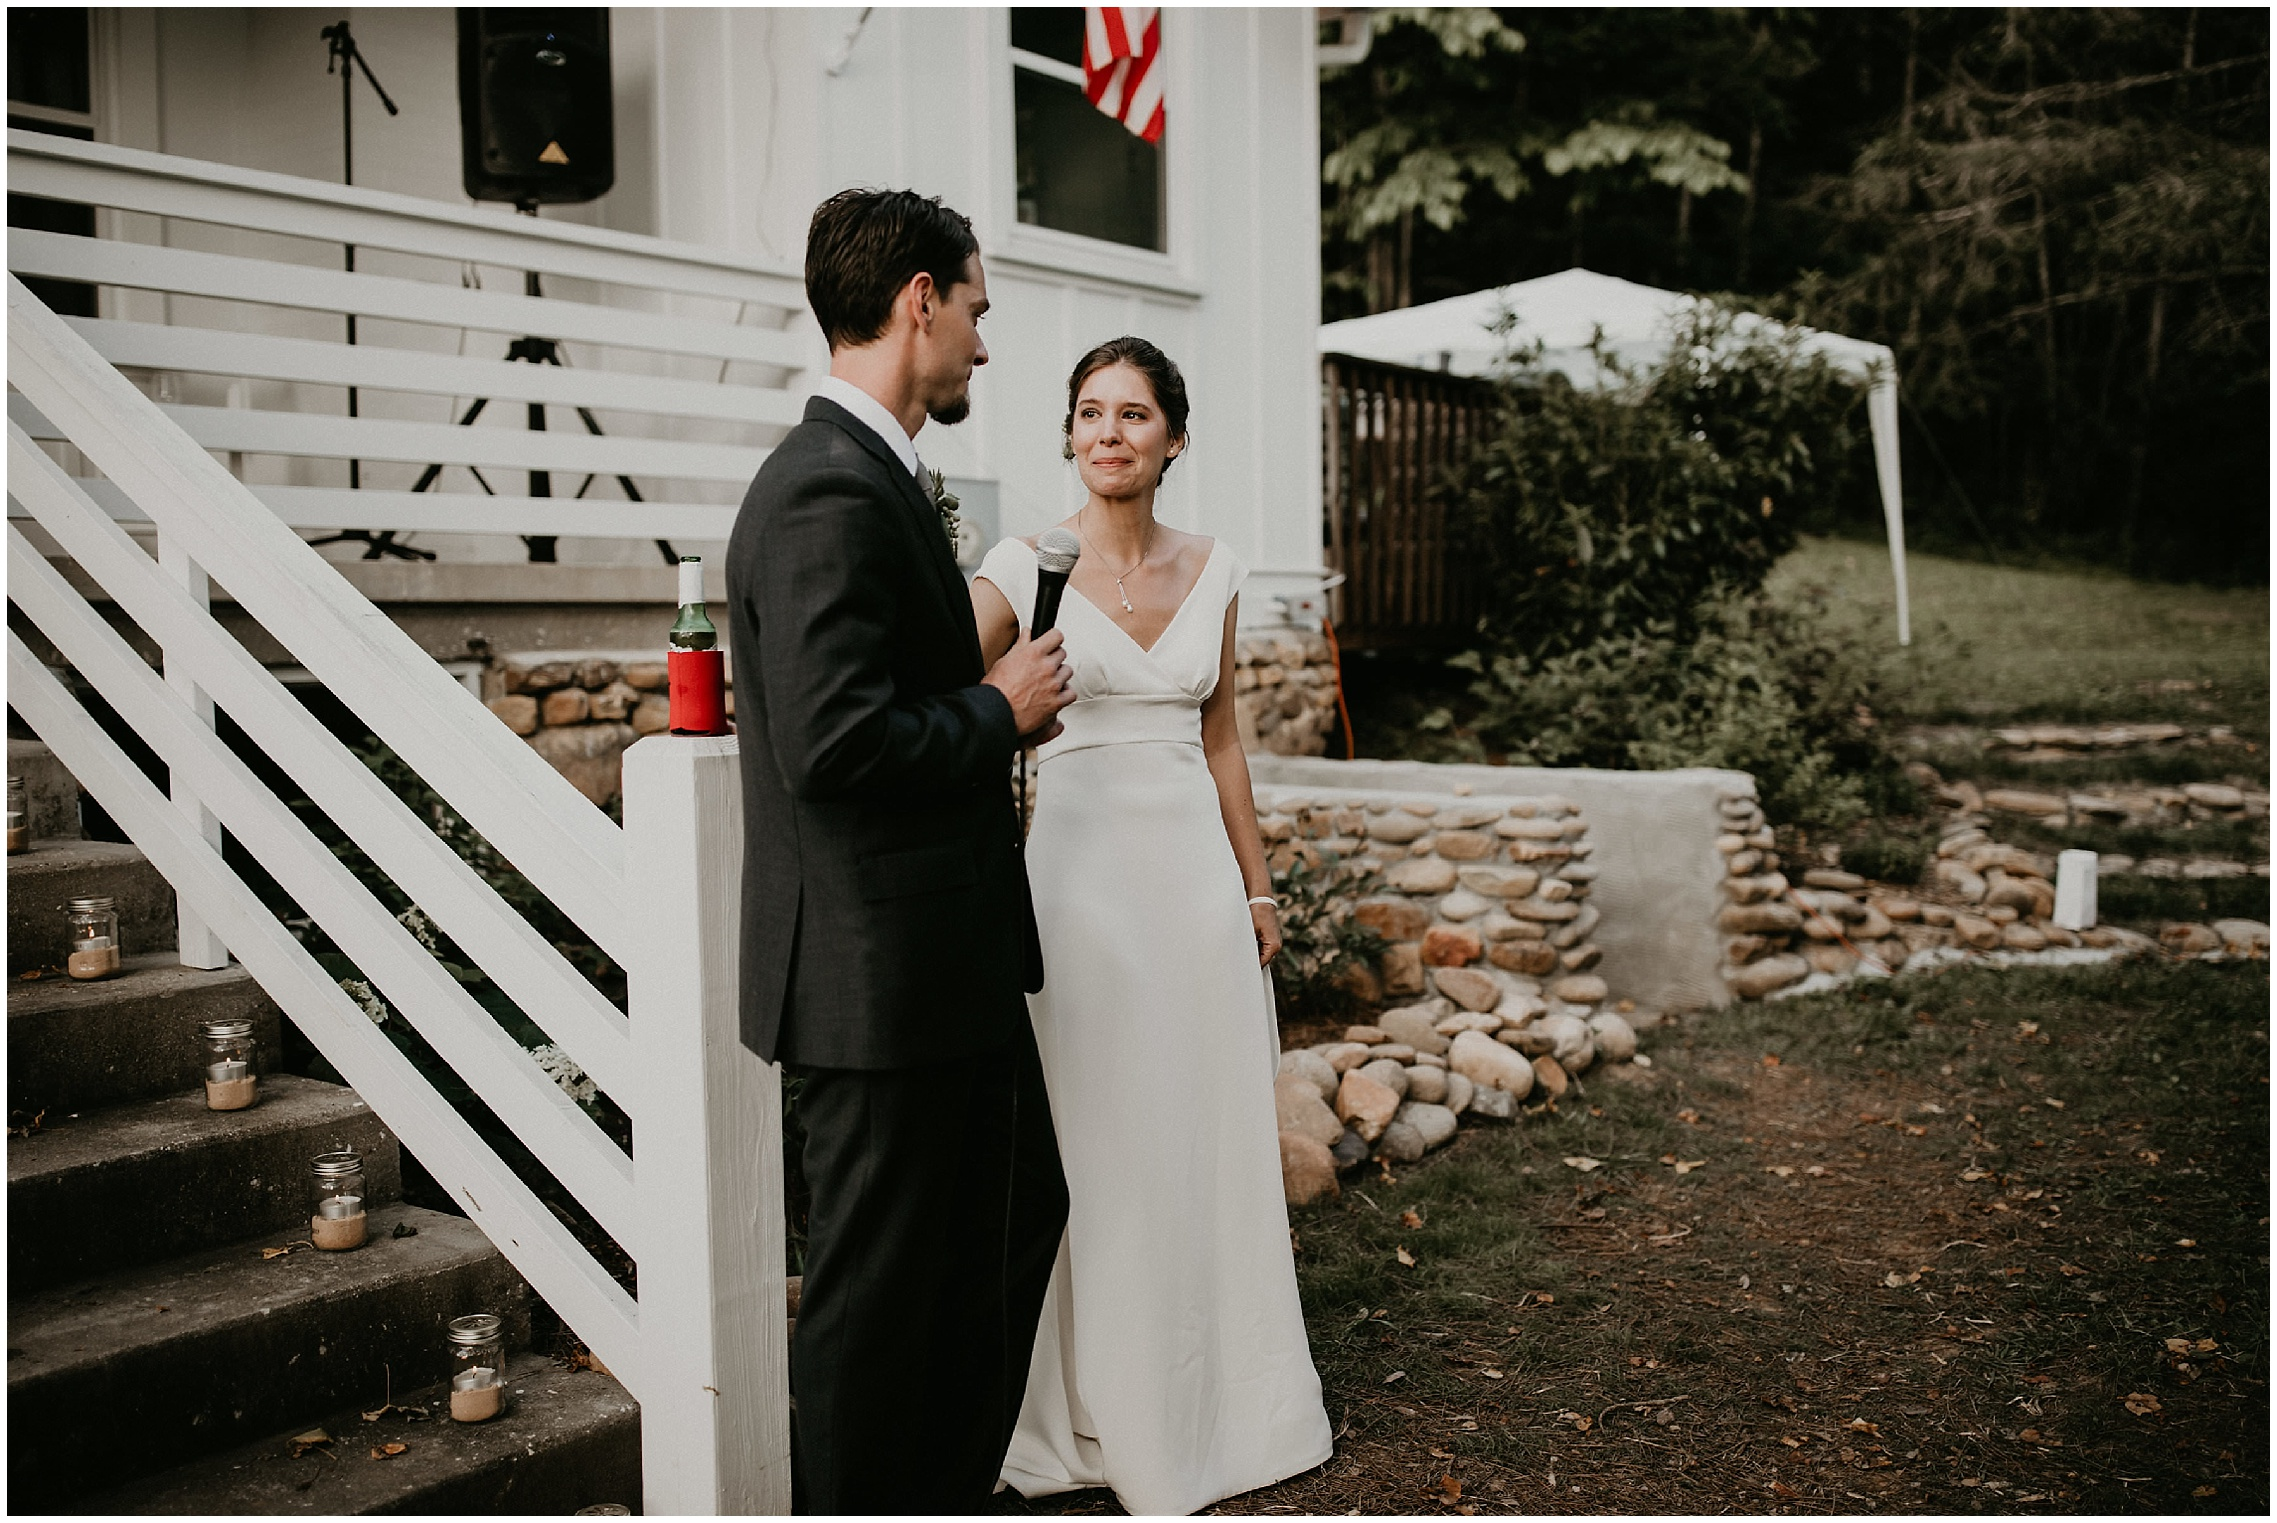 rock_creek_gardens_washington_wedding_photographer_0340.jpg